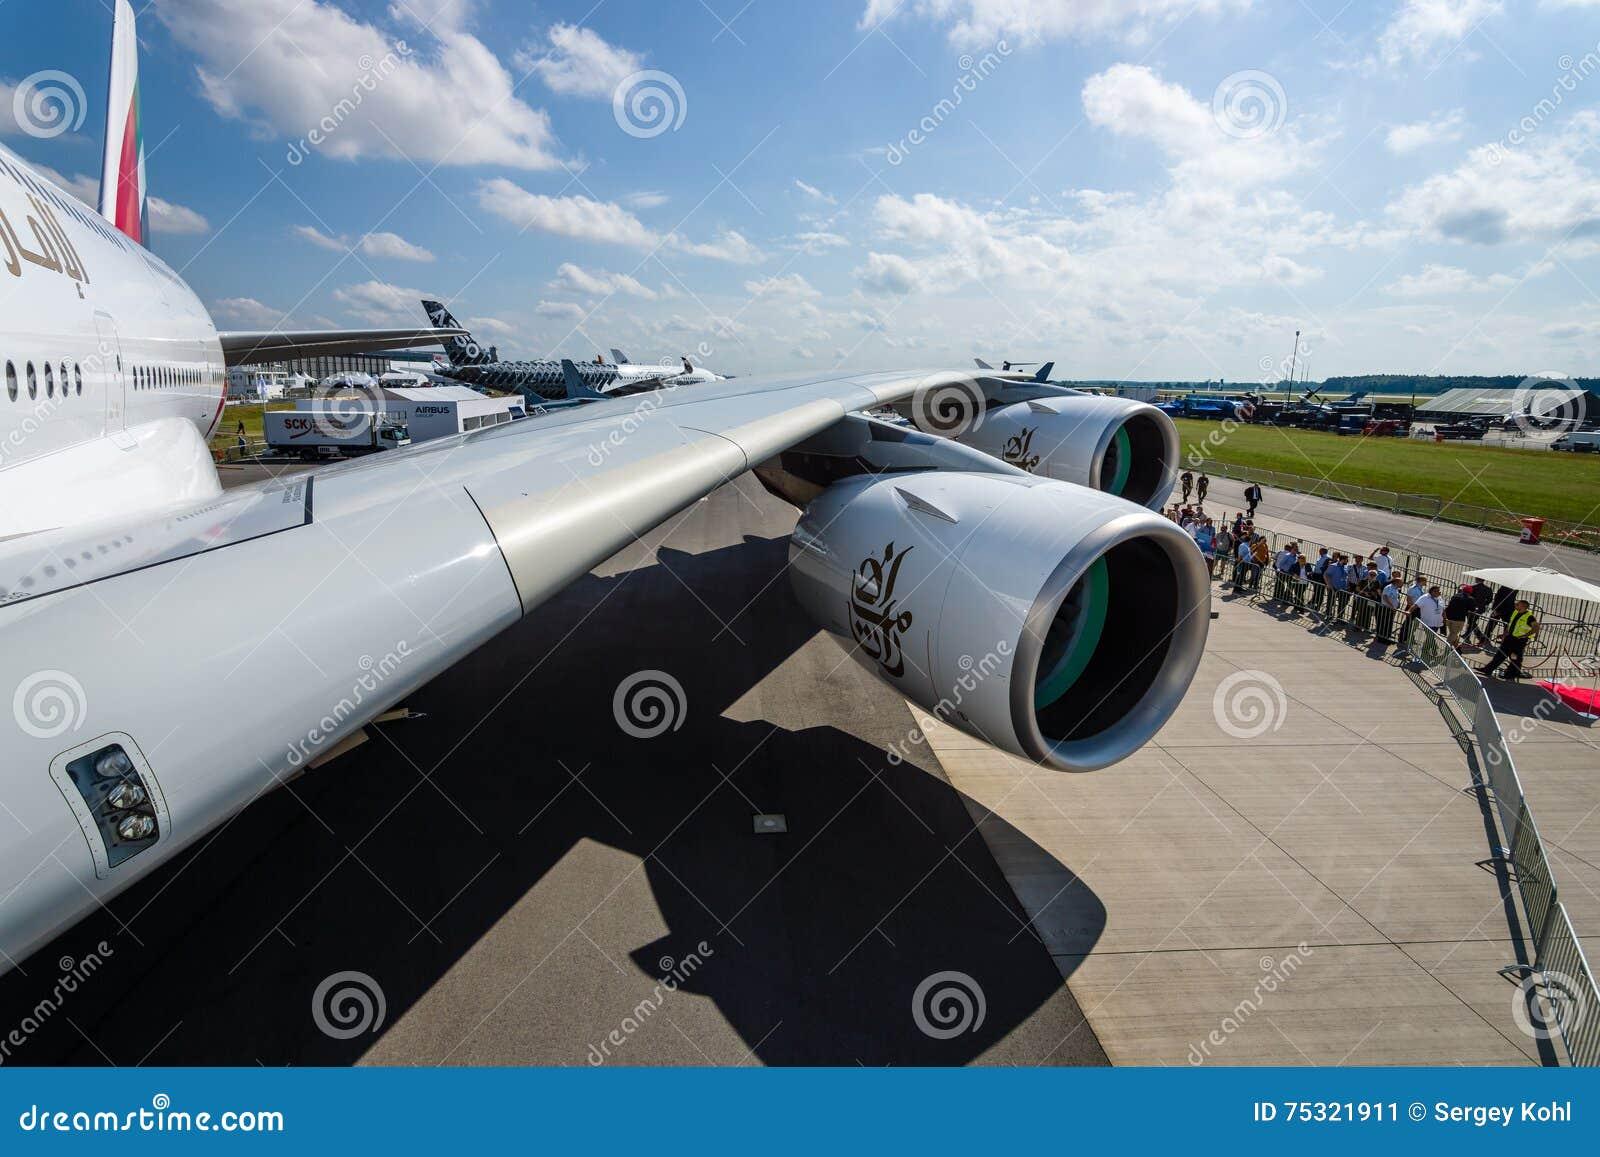 Detalj Av Vingen Och En Turbofan Motor Alliance Gp7000 Av